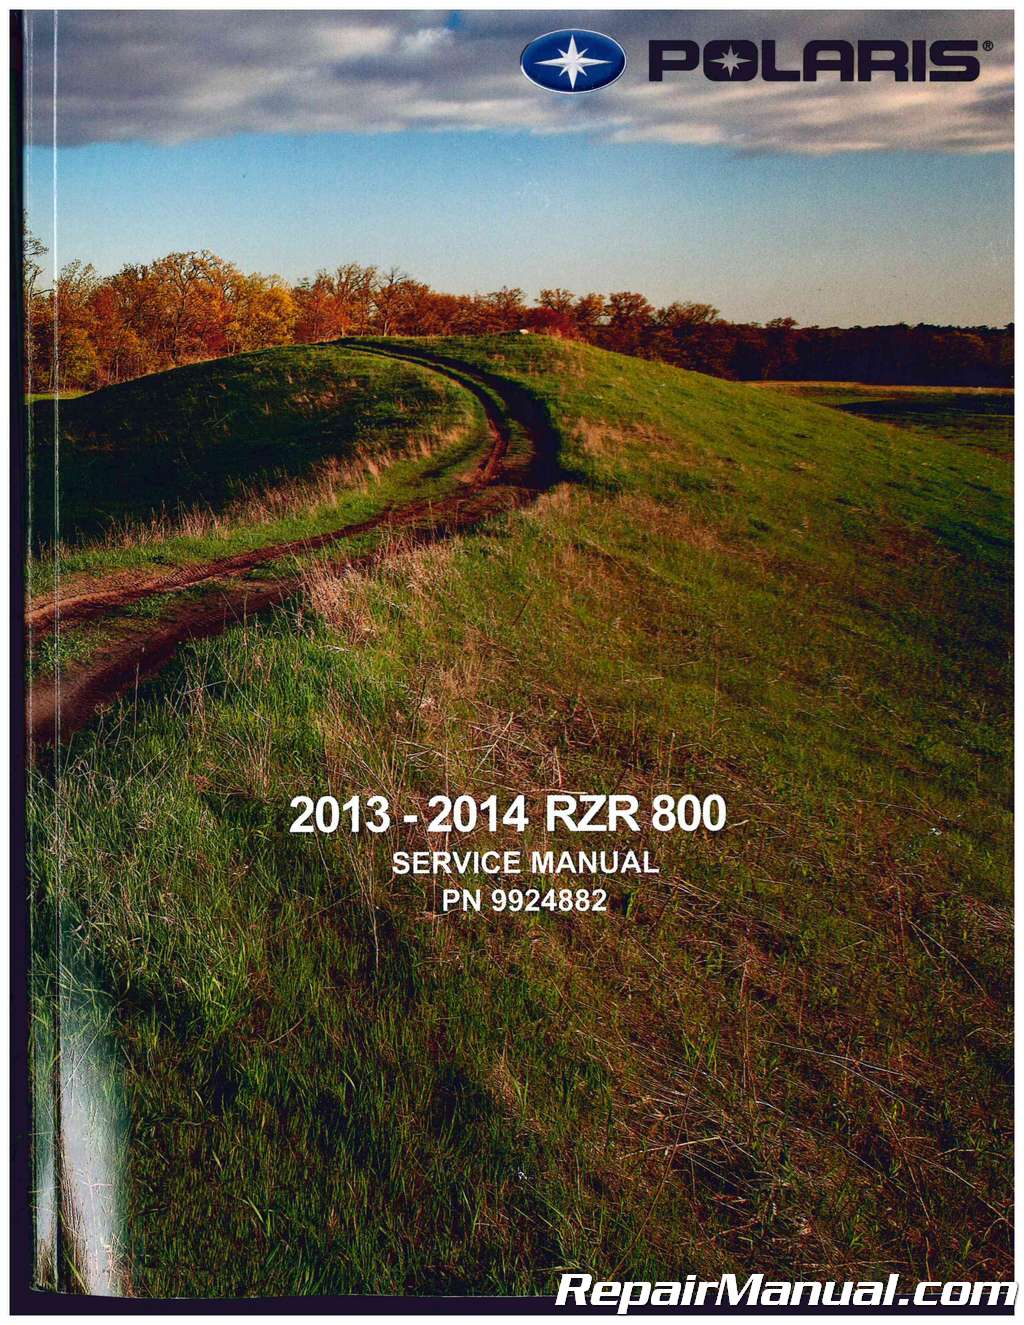 2013 2014 polaris ranger rzr 800 utv service manual rh repairmanual com Polaris RZR 800 S Polaris RZR 800 Radiator